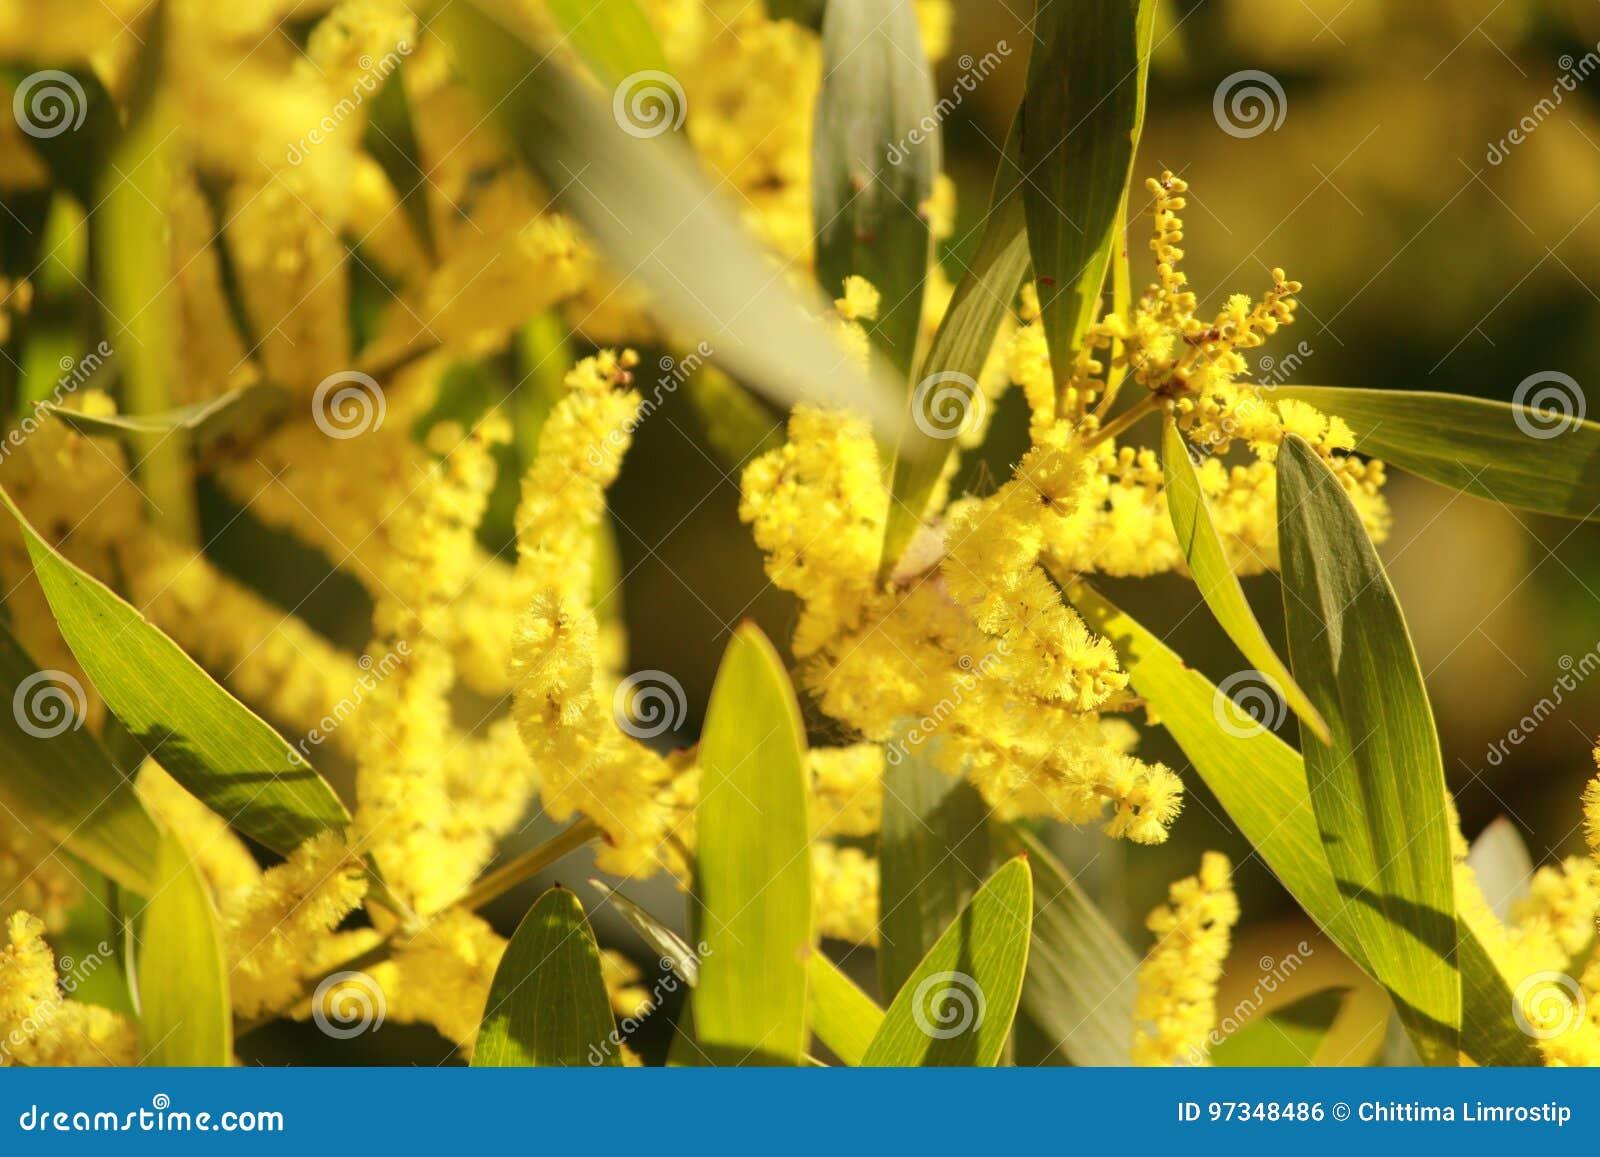 Australian yellow flowers stock photo image of jetty 97348486 australian yellow flowers mightylinksfo